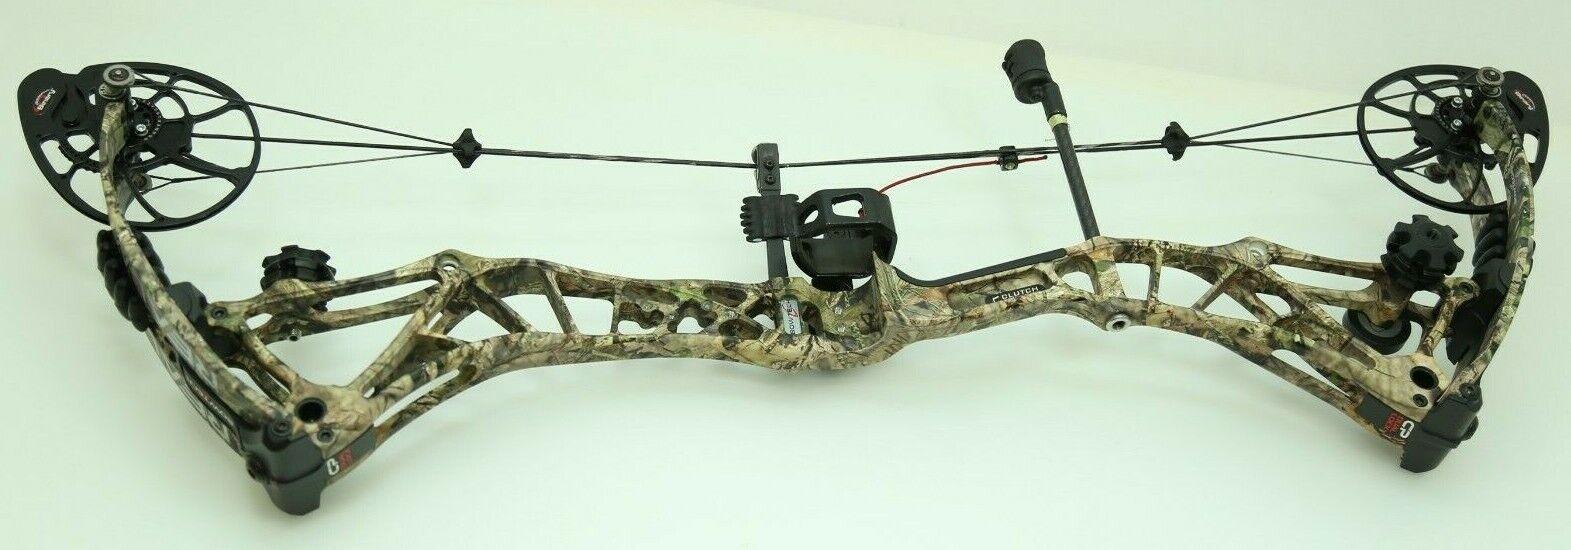 Bowtech Archery Realm Right Hand 29  70lb Camo Compound Bow